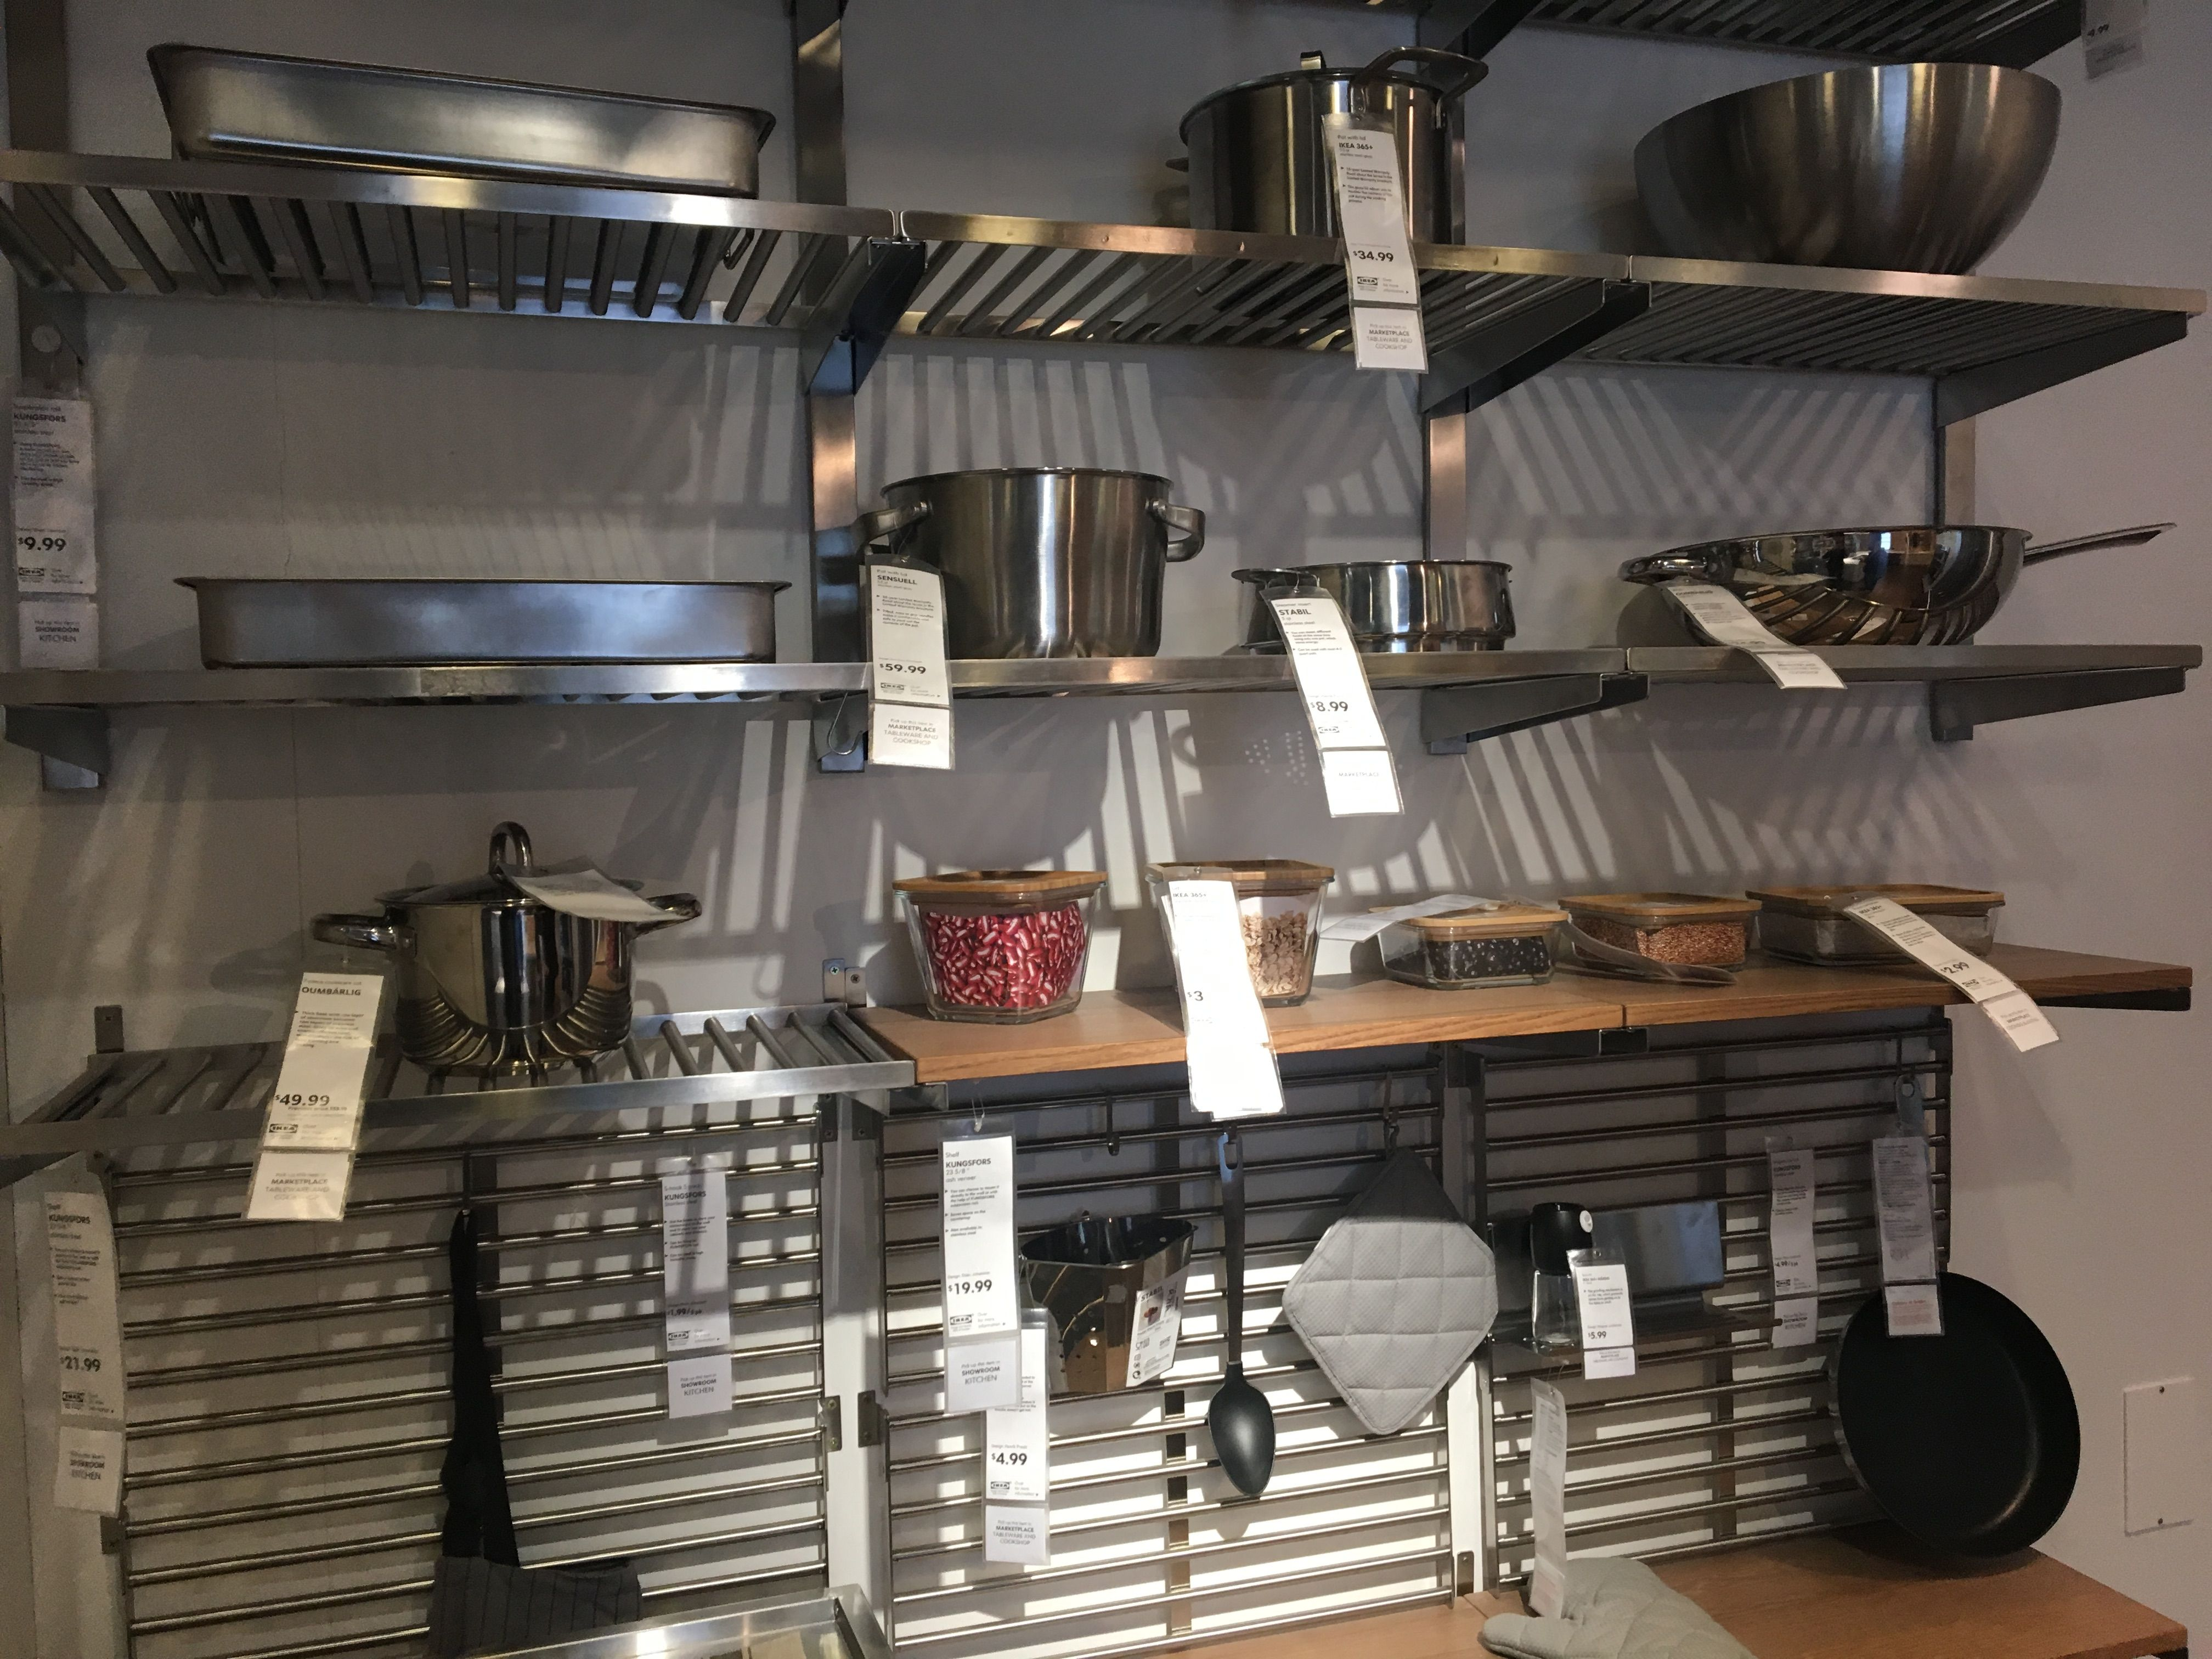 Kungsfors Shelf Stainless Steel Ikea Kitchen Fittings Shelves Ikea Shelves